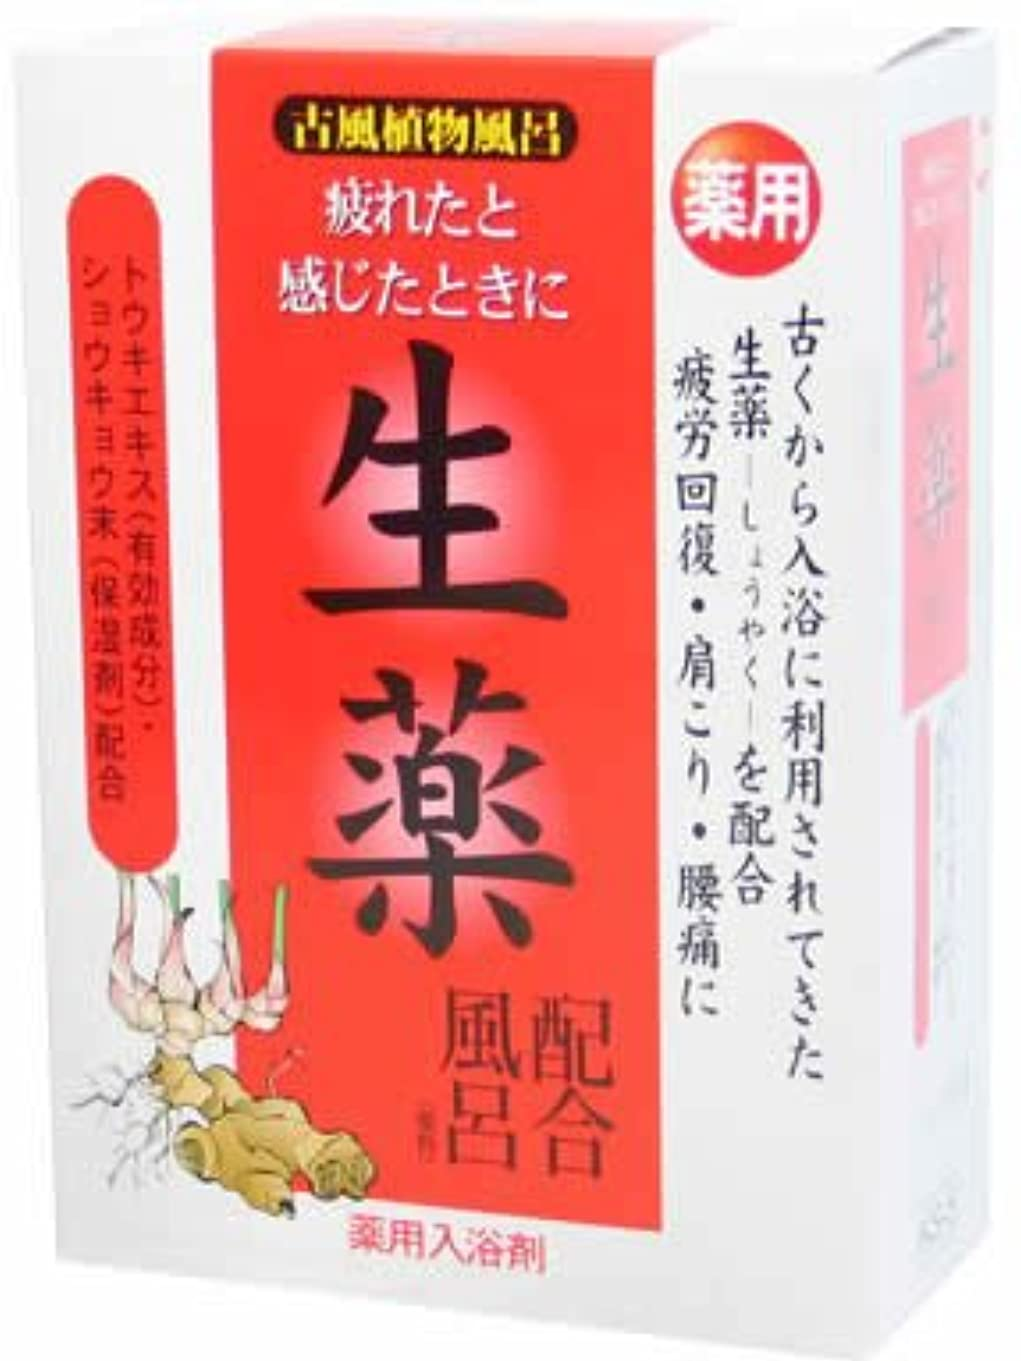 廃止する発症明確な古風植物風呂 生薬配合風呂 25g×5包(入浴剤) [医薬部外品]